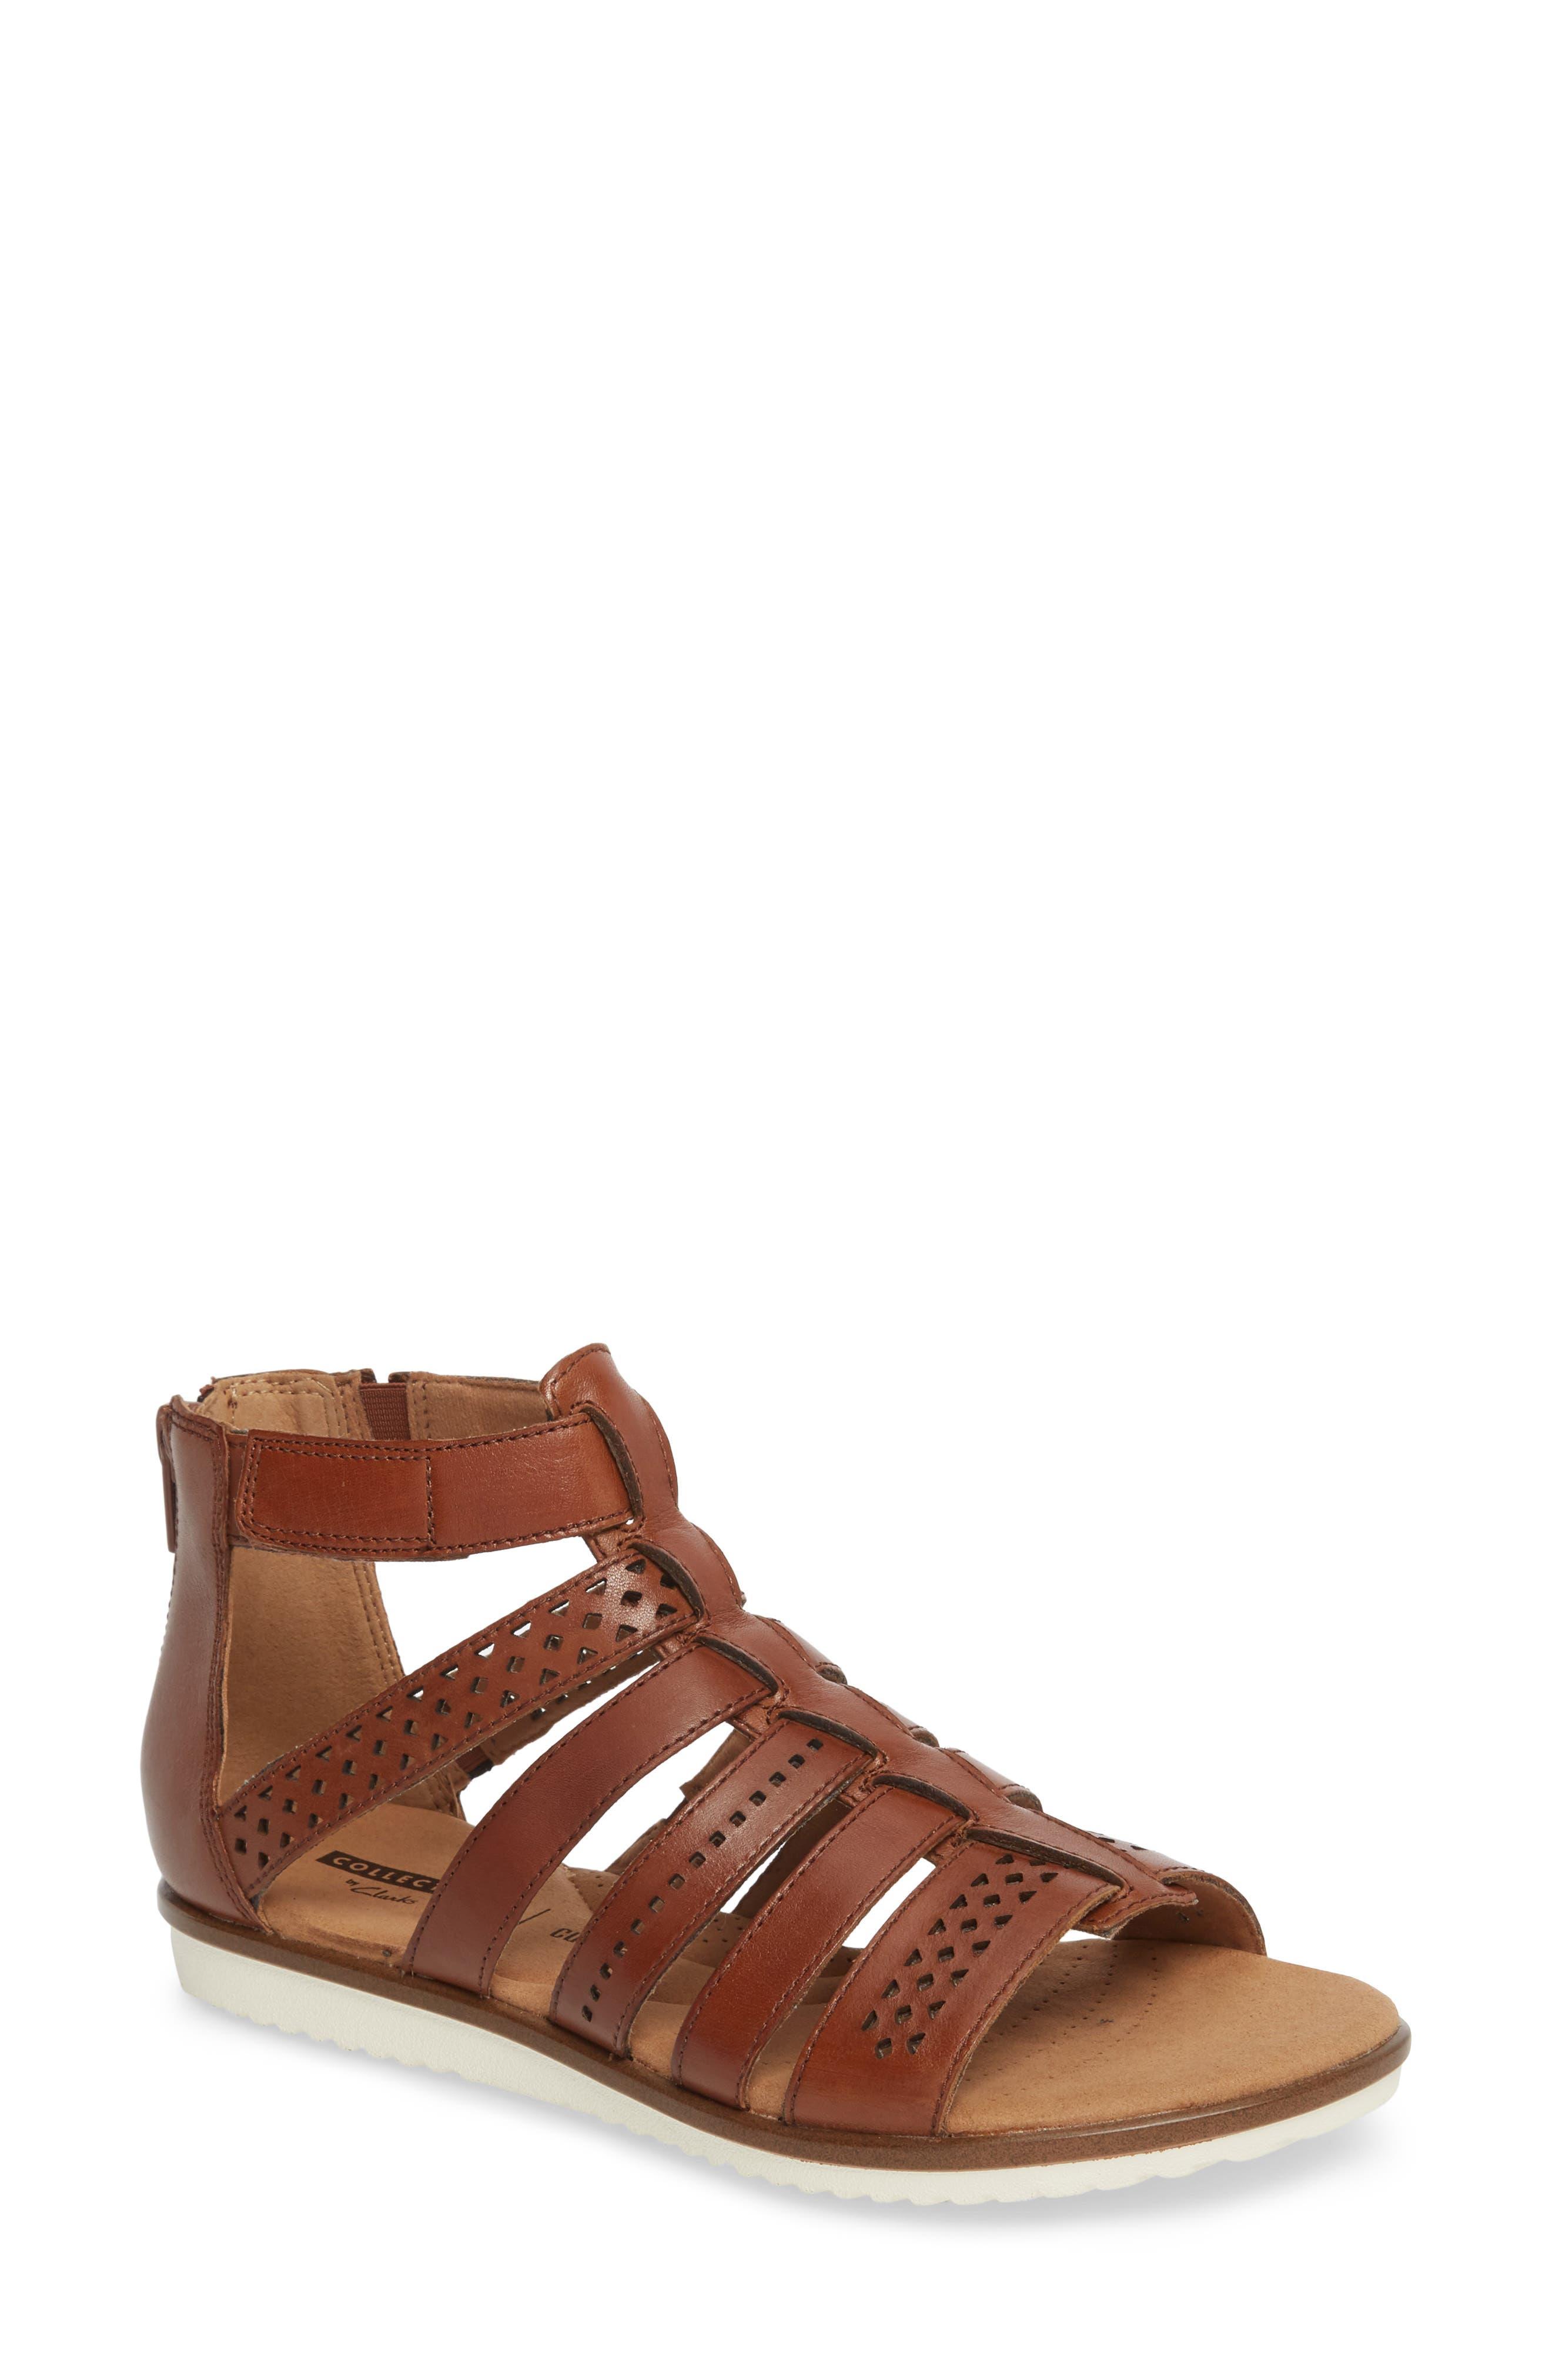 Kele Lotus Sandal,                         Main,                         color, Beige Leather